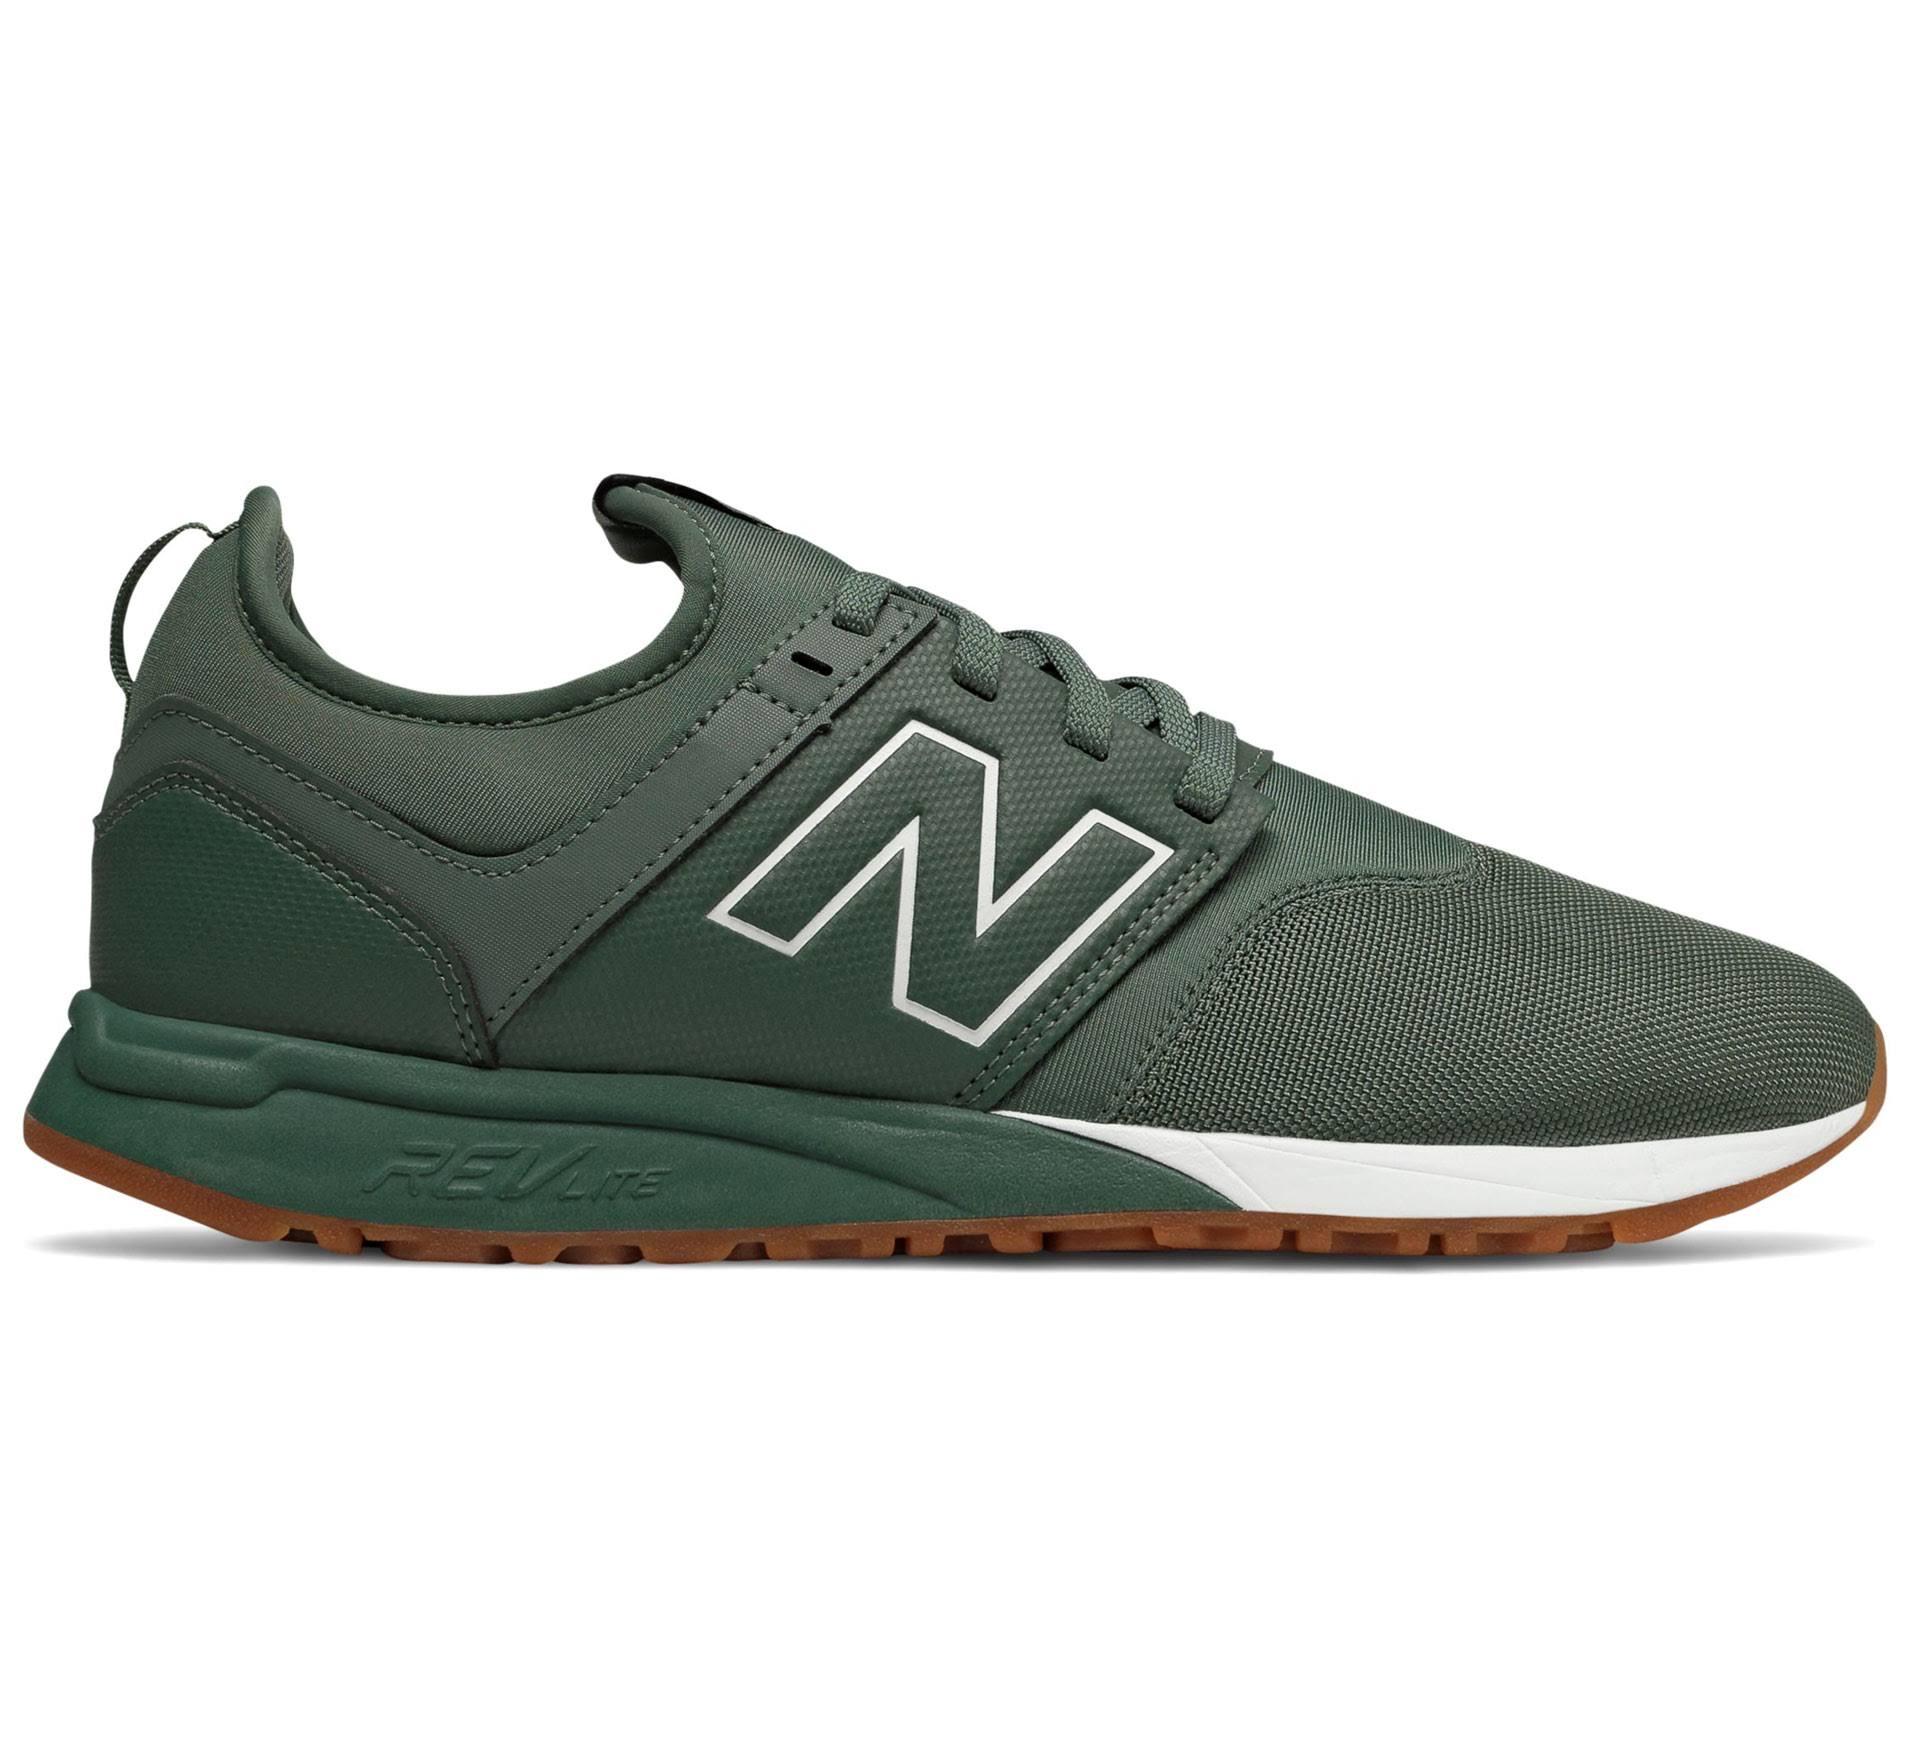 Smaragd Sneaker Smaragd Balance Balance 247 Sneaker Balance Sneaker 247 New New New 247 UpzMSV